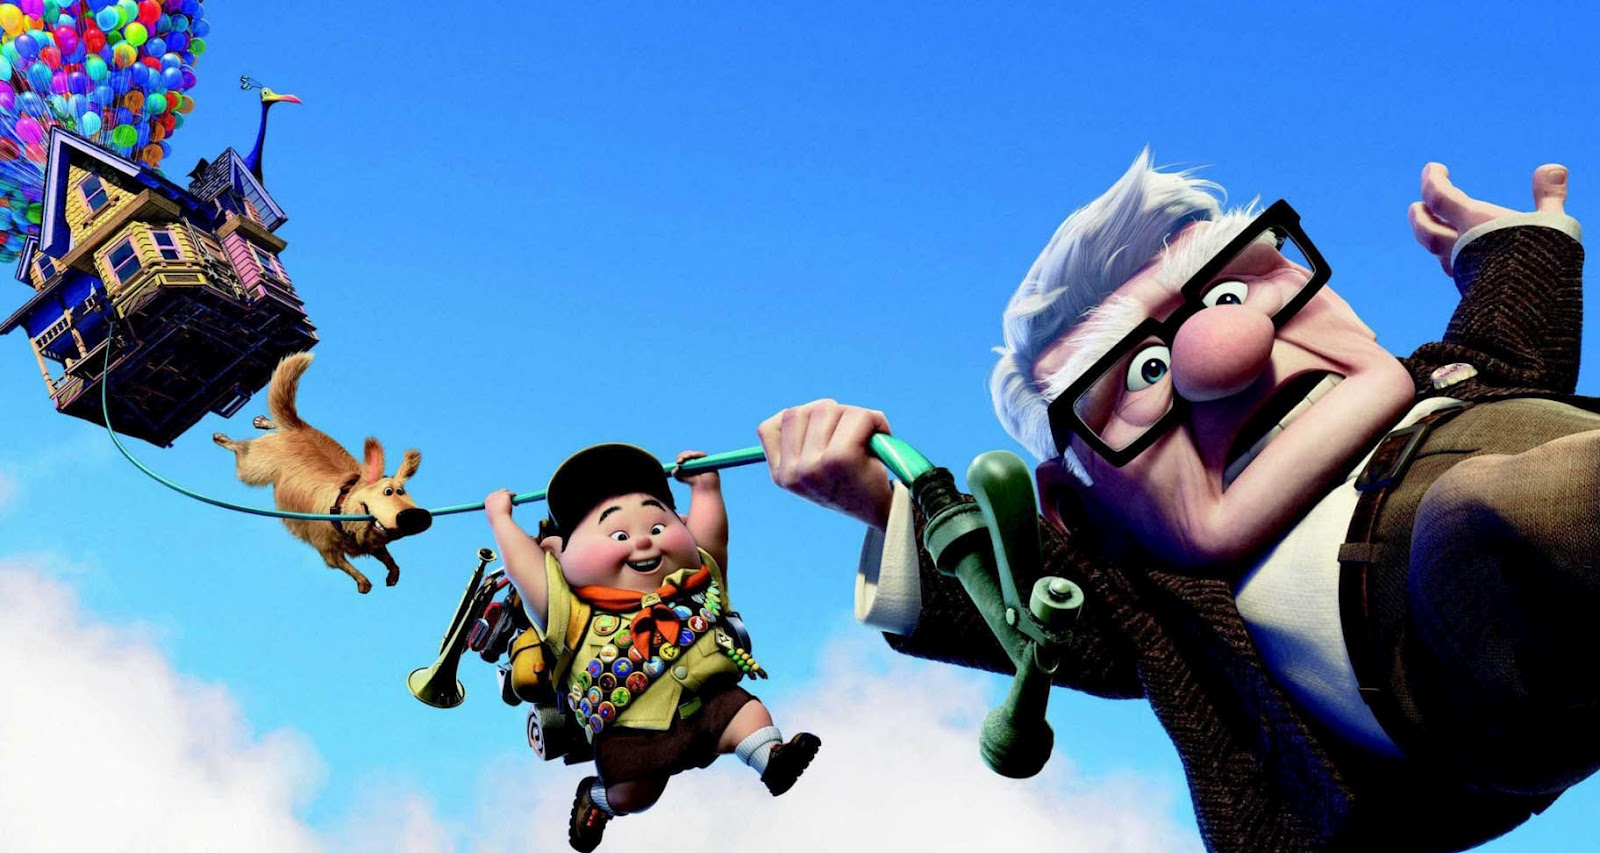 Mater Cars Wallpaper Walt Disney Pixar Up Cartoon Characters Pictures For Kids